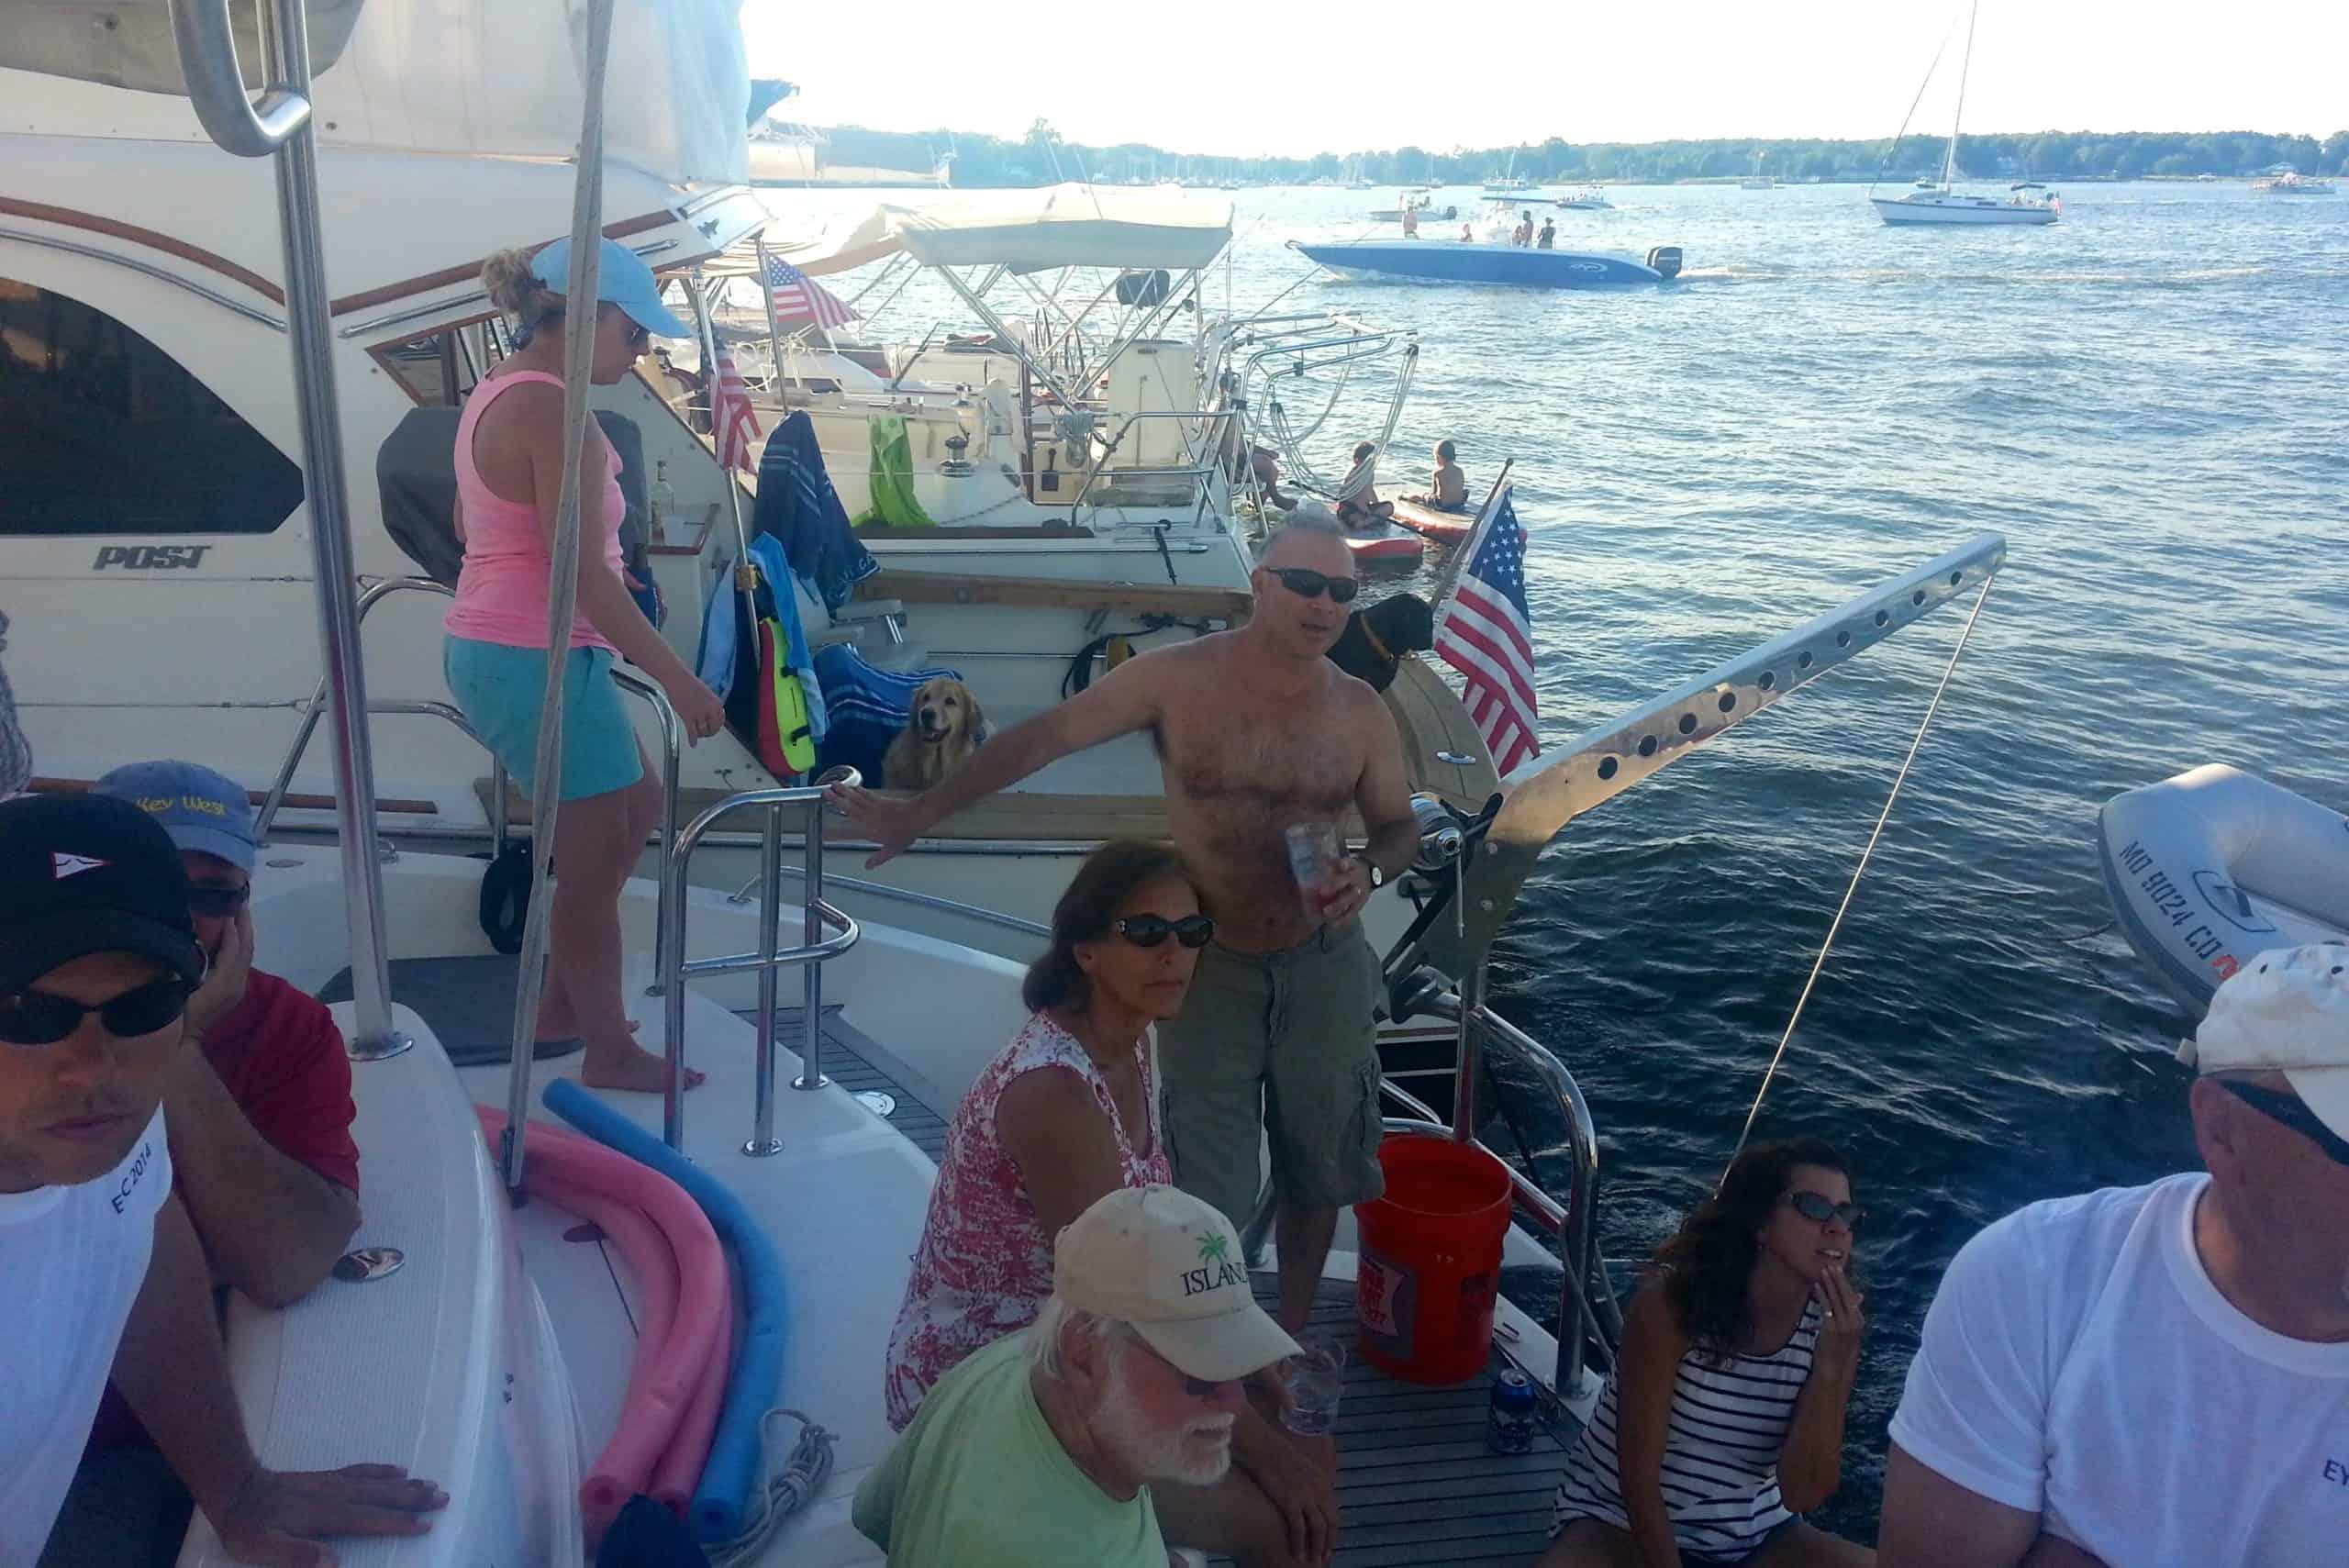 Sailing in the Chesapeake